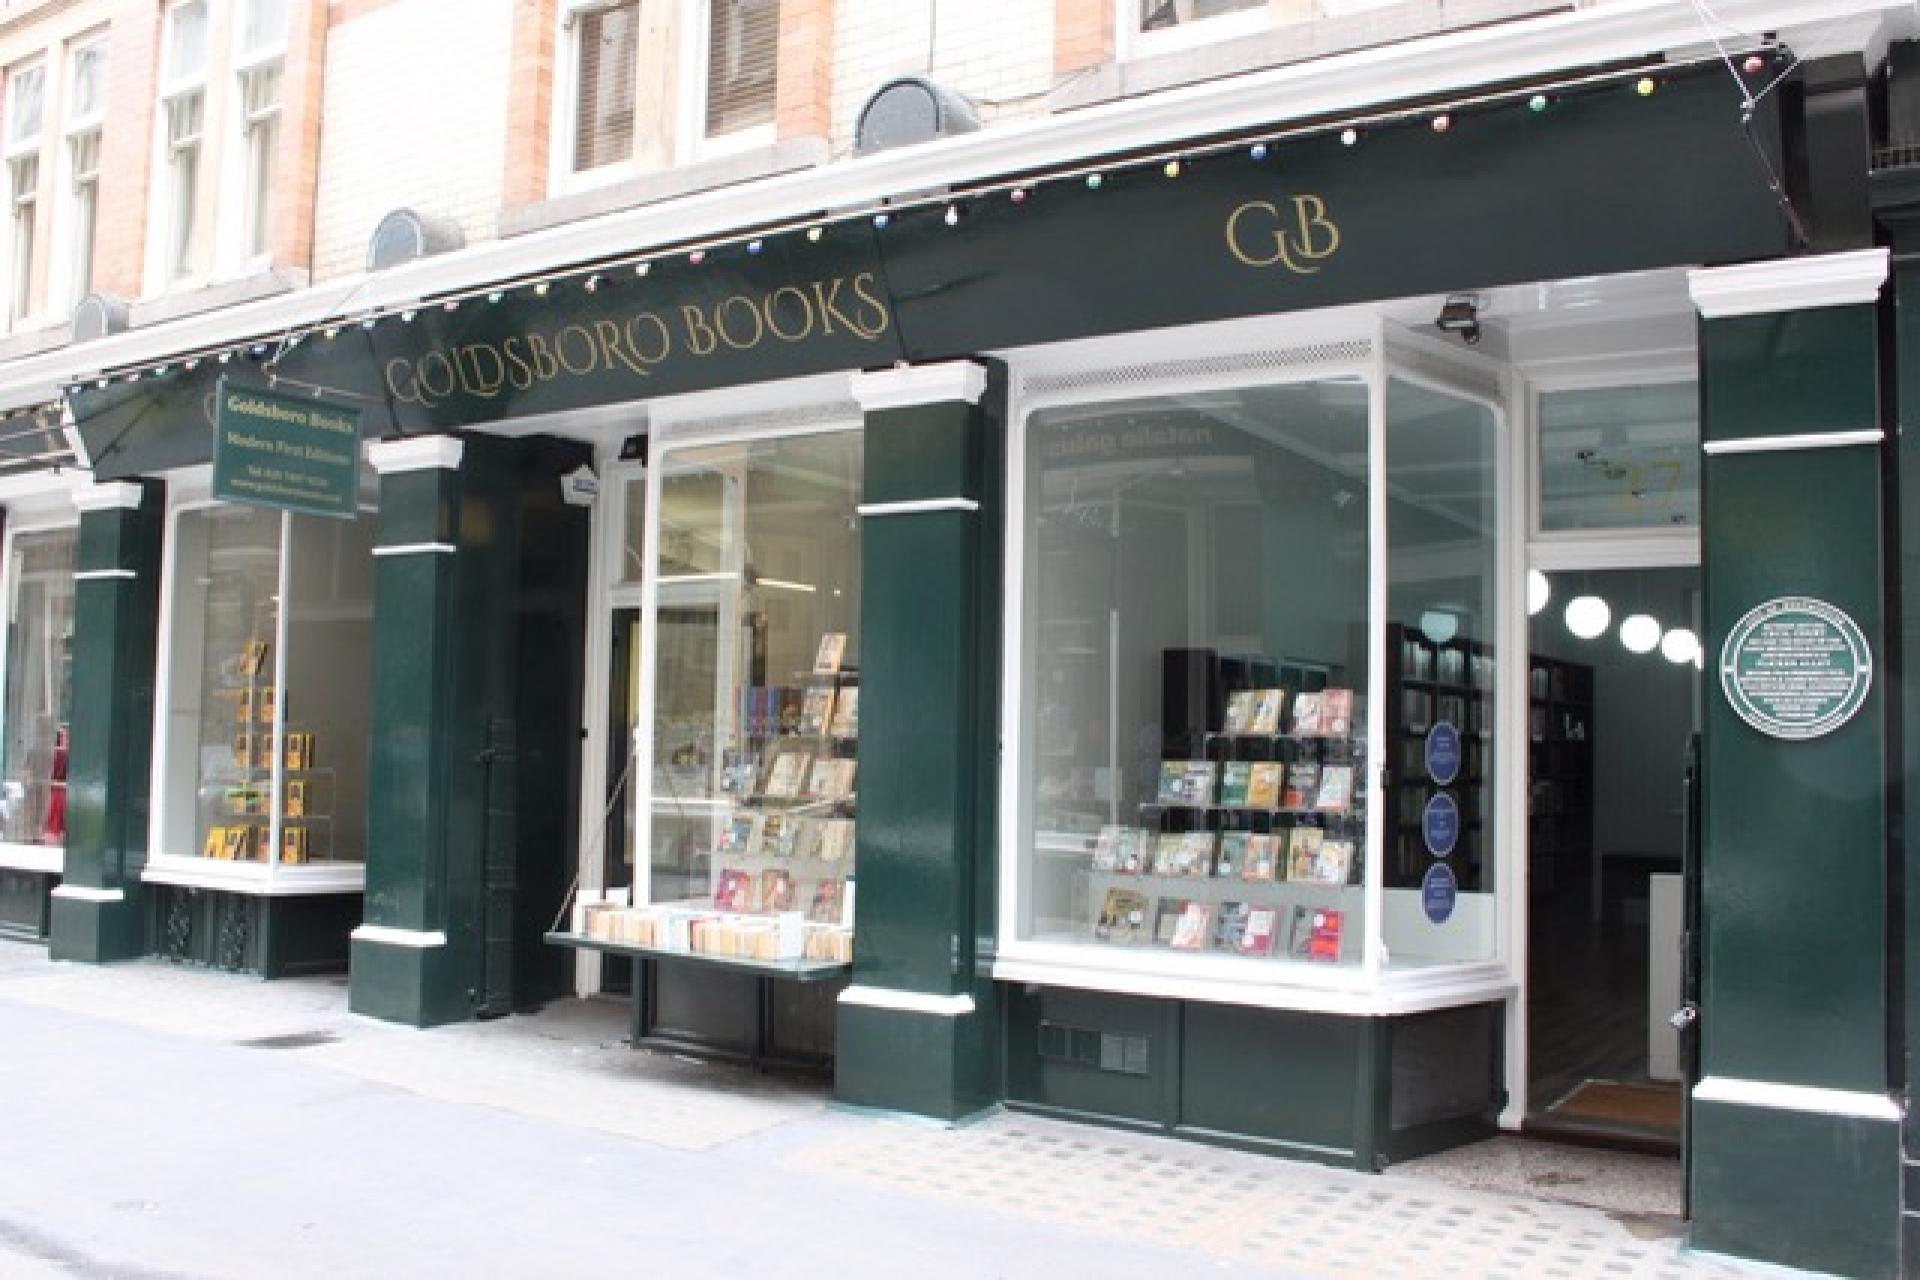 LoveReading Bookshop of the Month: Goldsboro Books